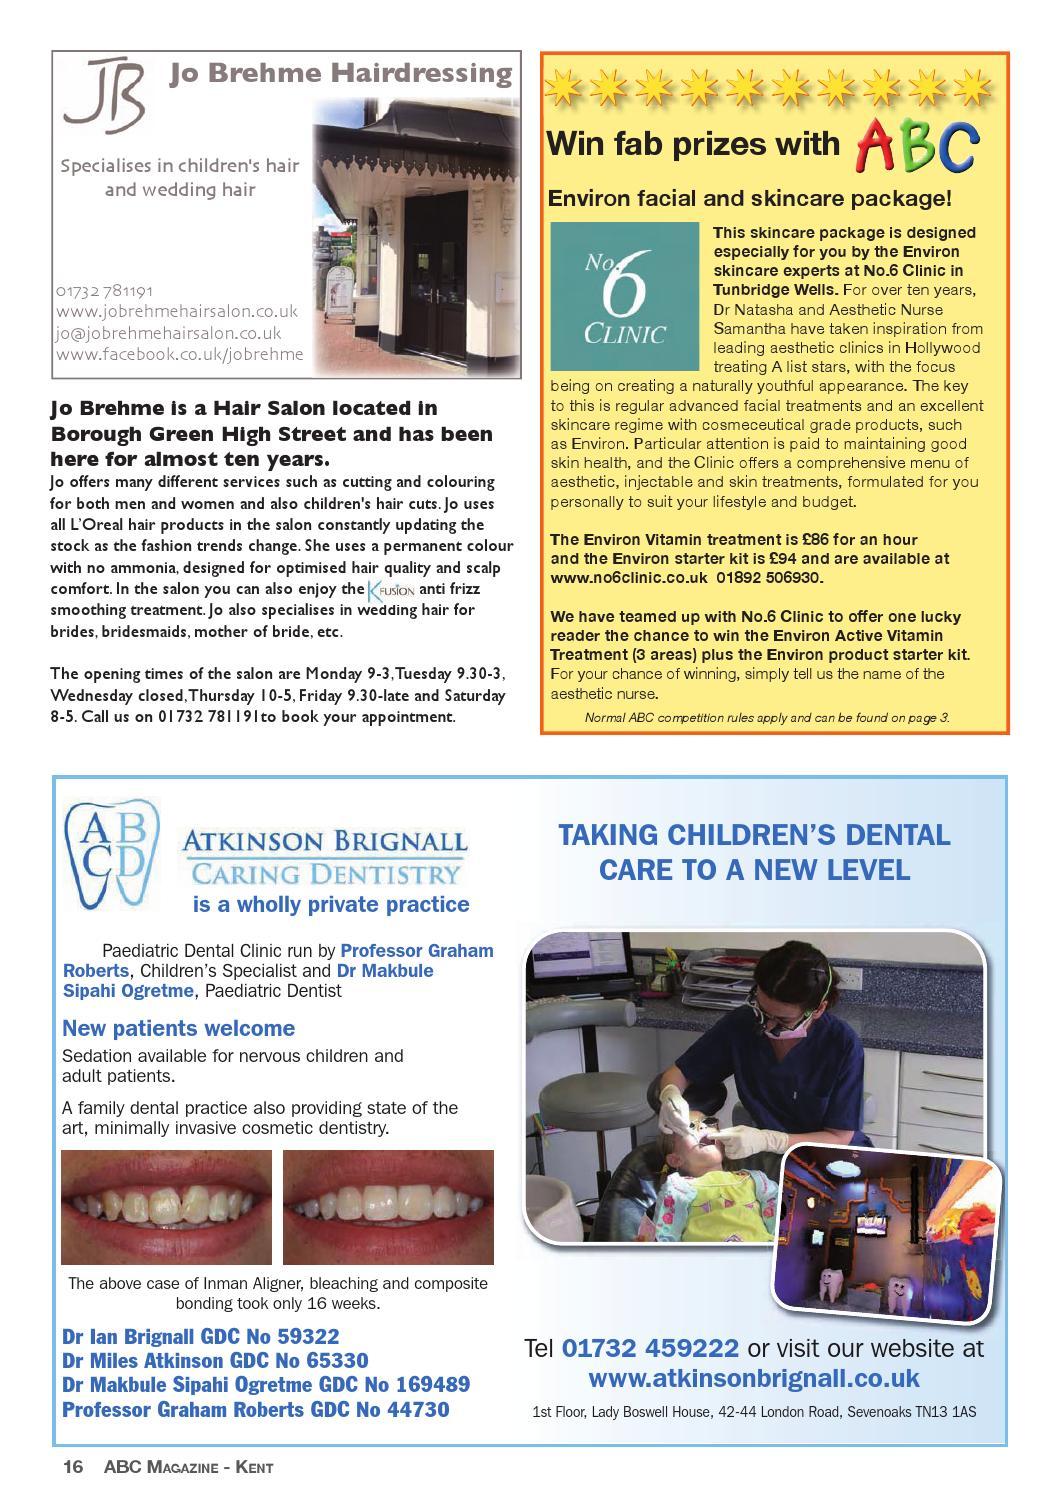 Abc Dental Care abc kent winter 2014abc-digital - issuu